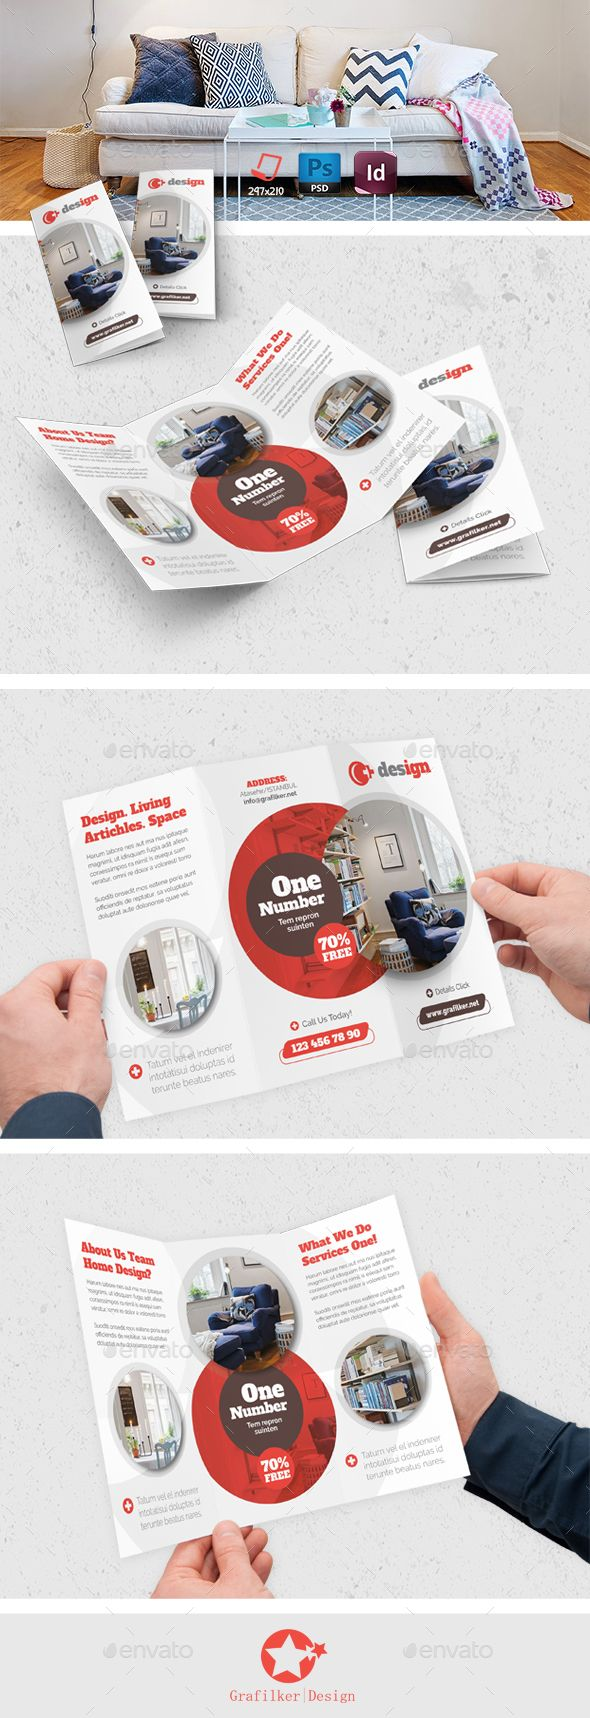 Interior Design Tri Fold Template PSD InDesign INDD Download